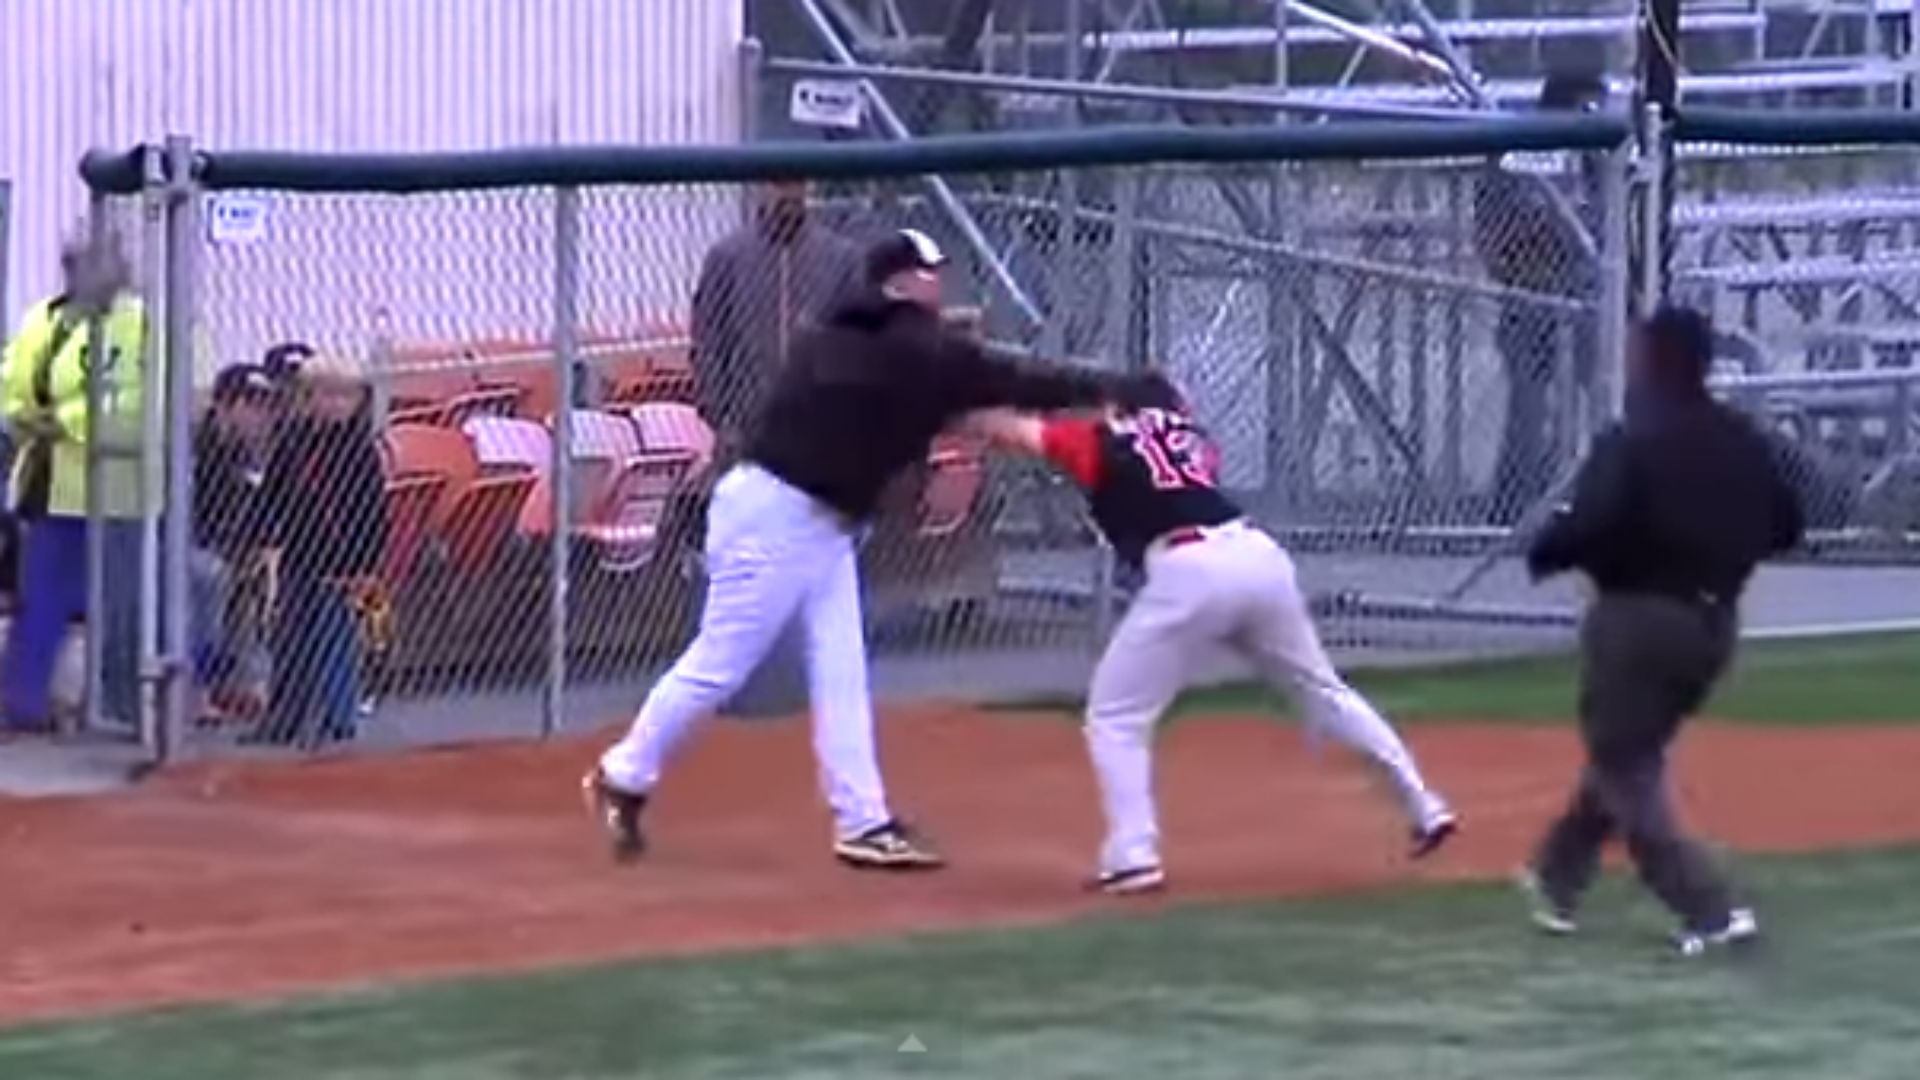 baseball game fight